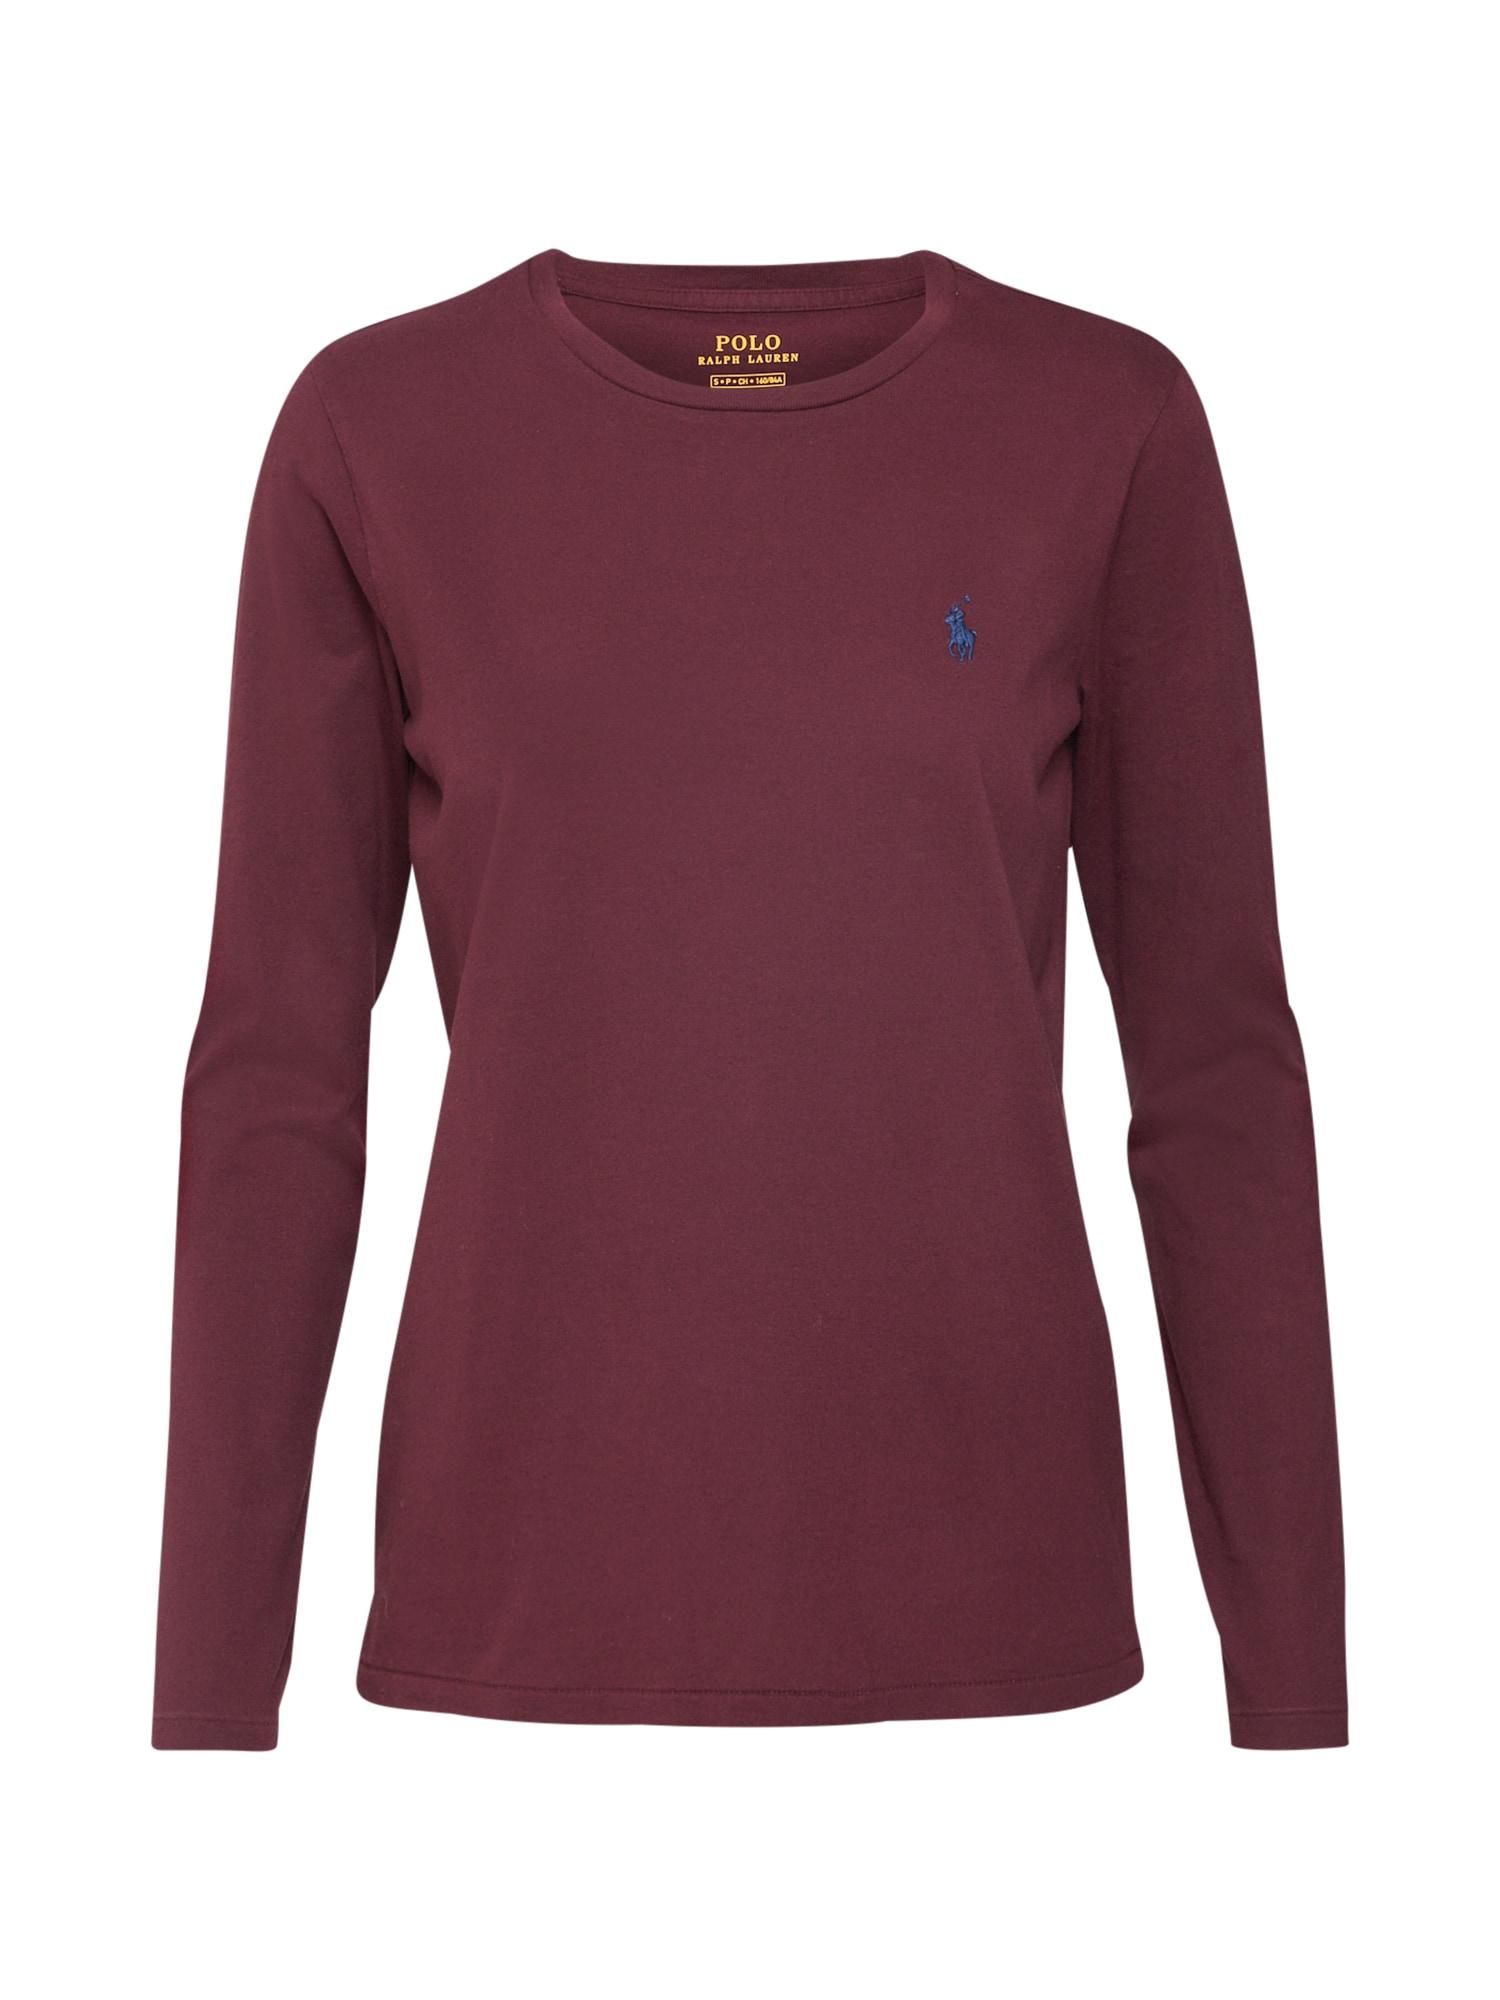 Tričko tmavě červená POLO RALPH LAUREN